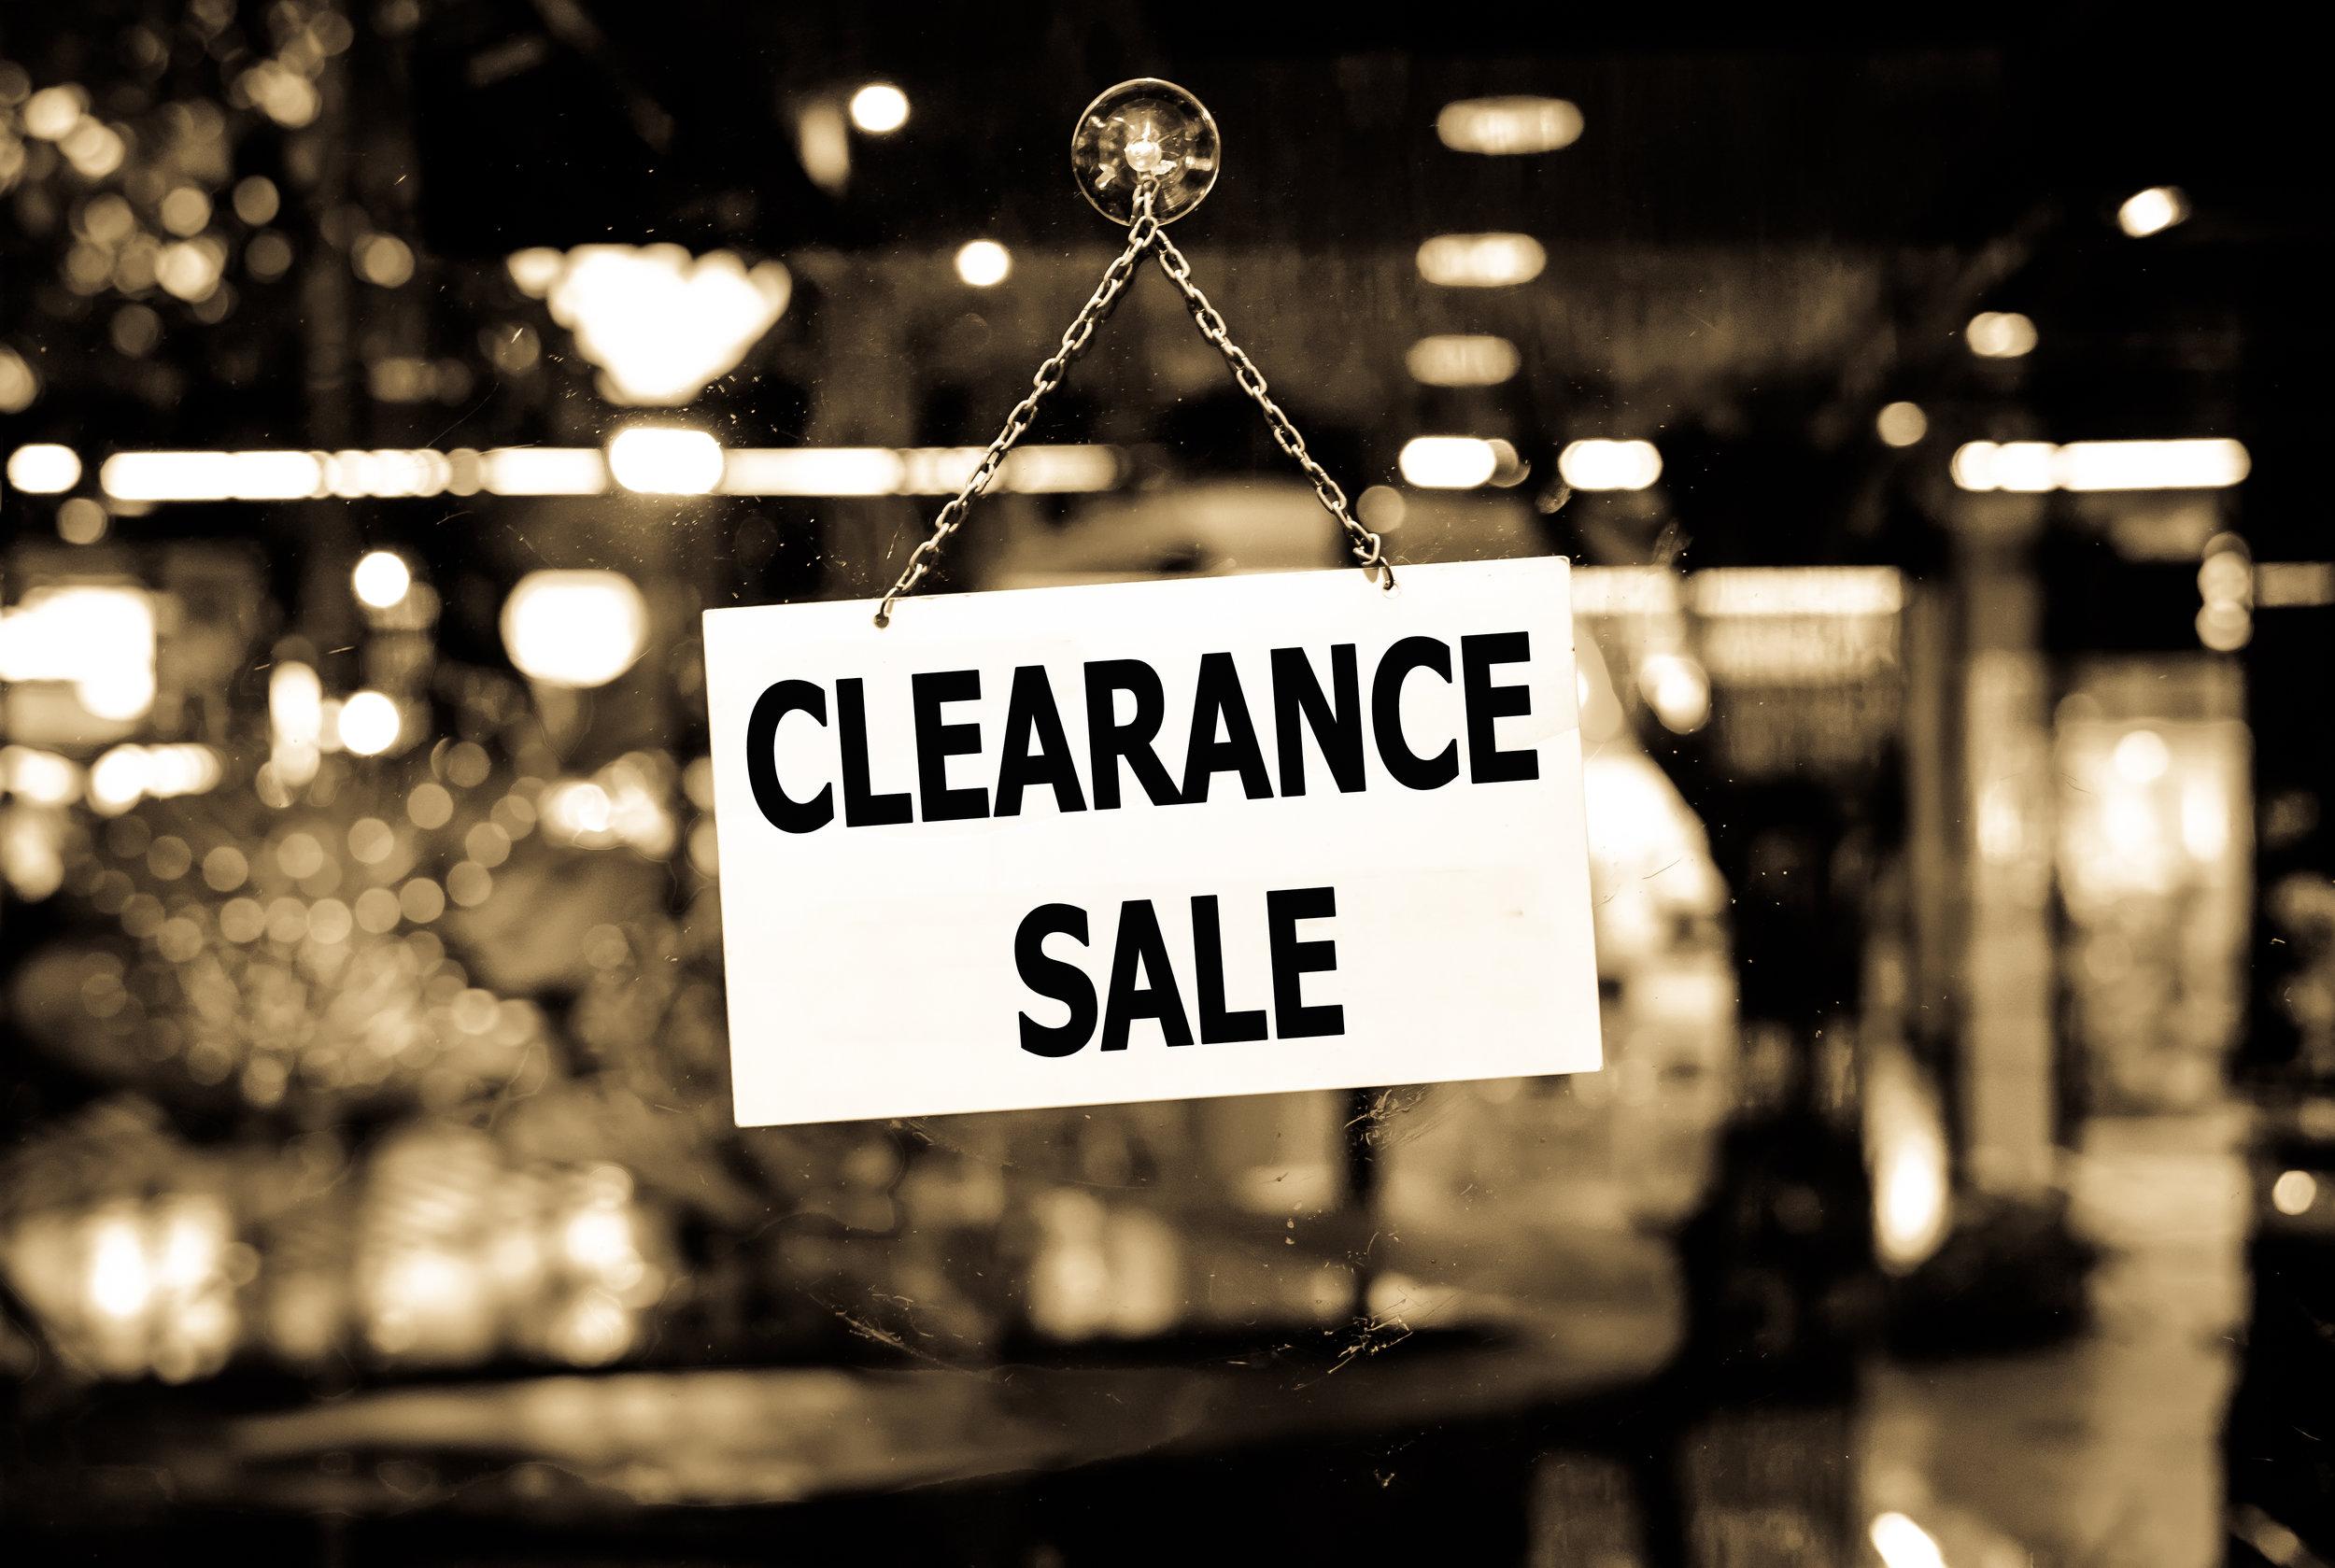 clearance_sale.jpg